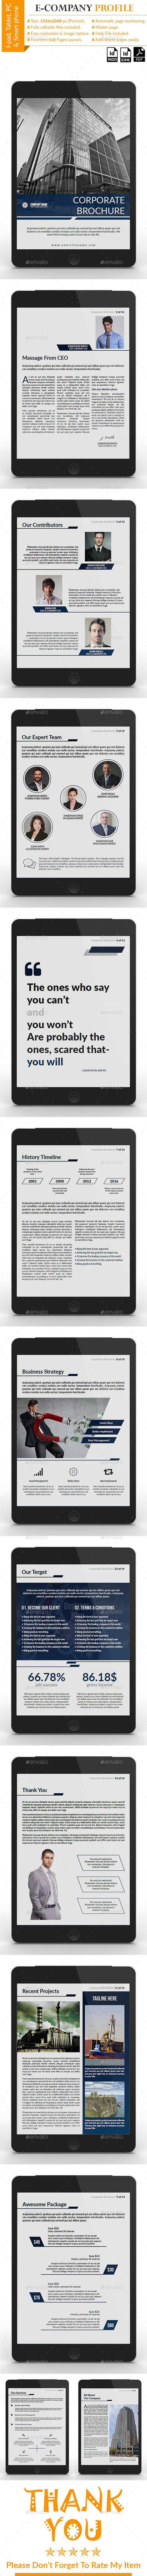 E-company Profile - Digital Books ePublishing